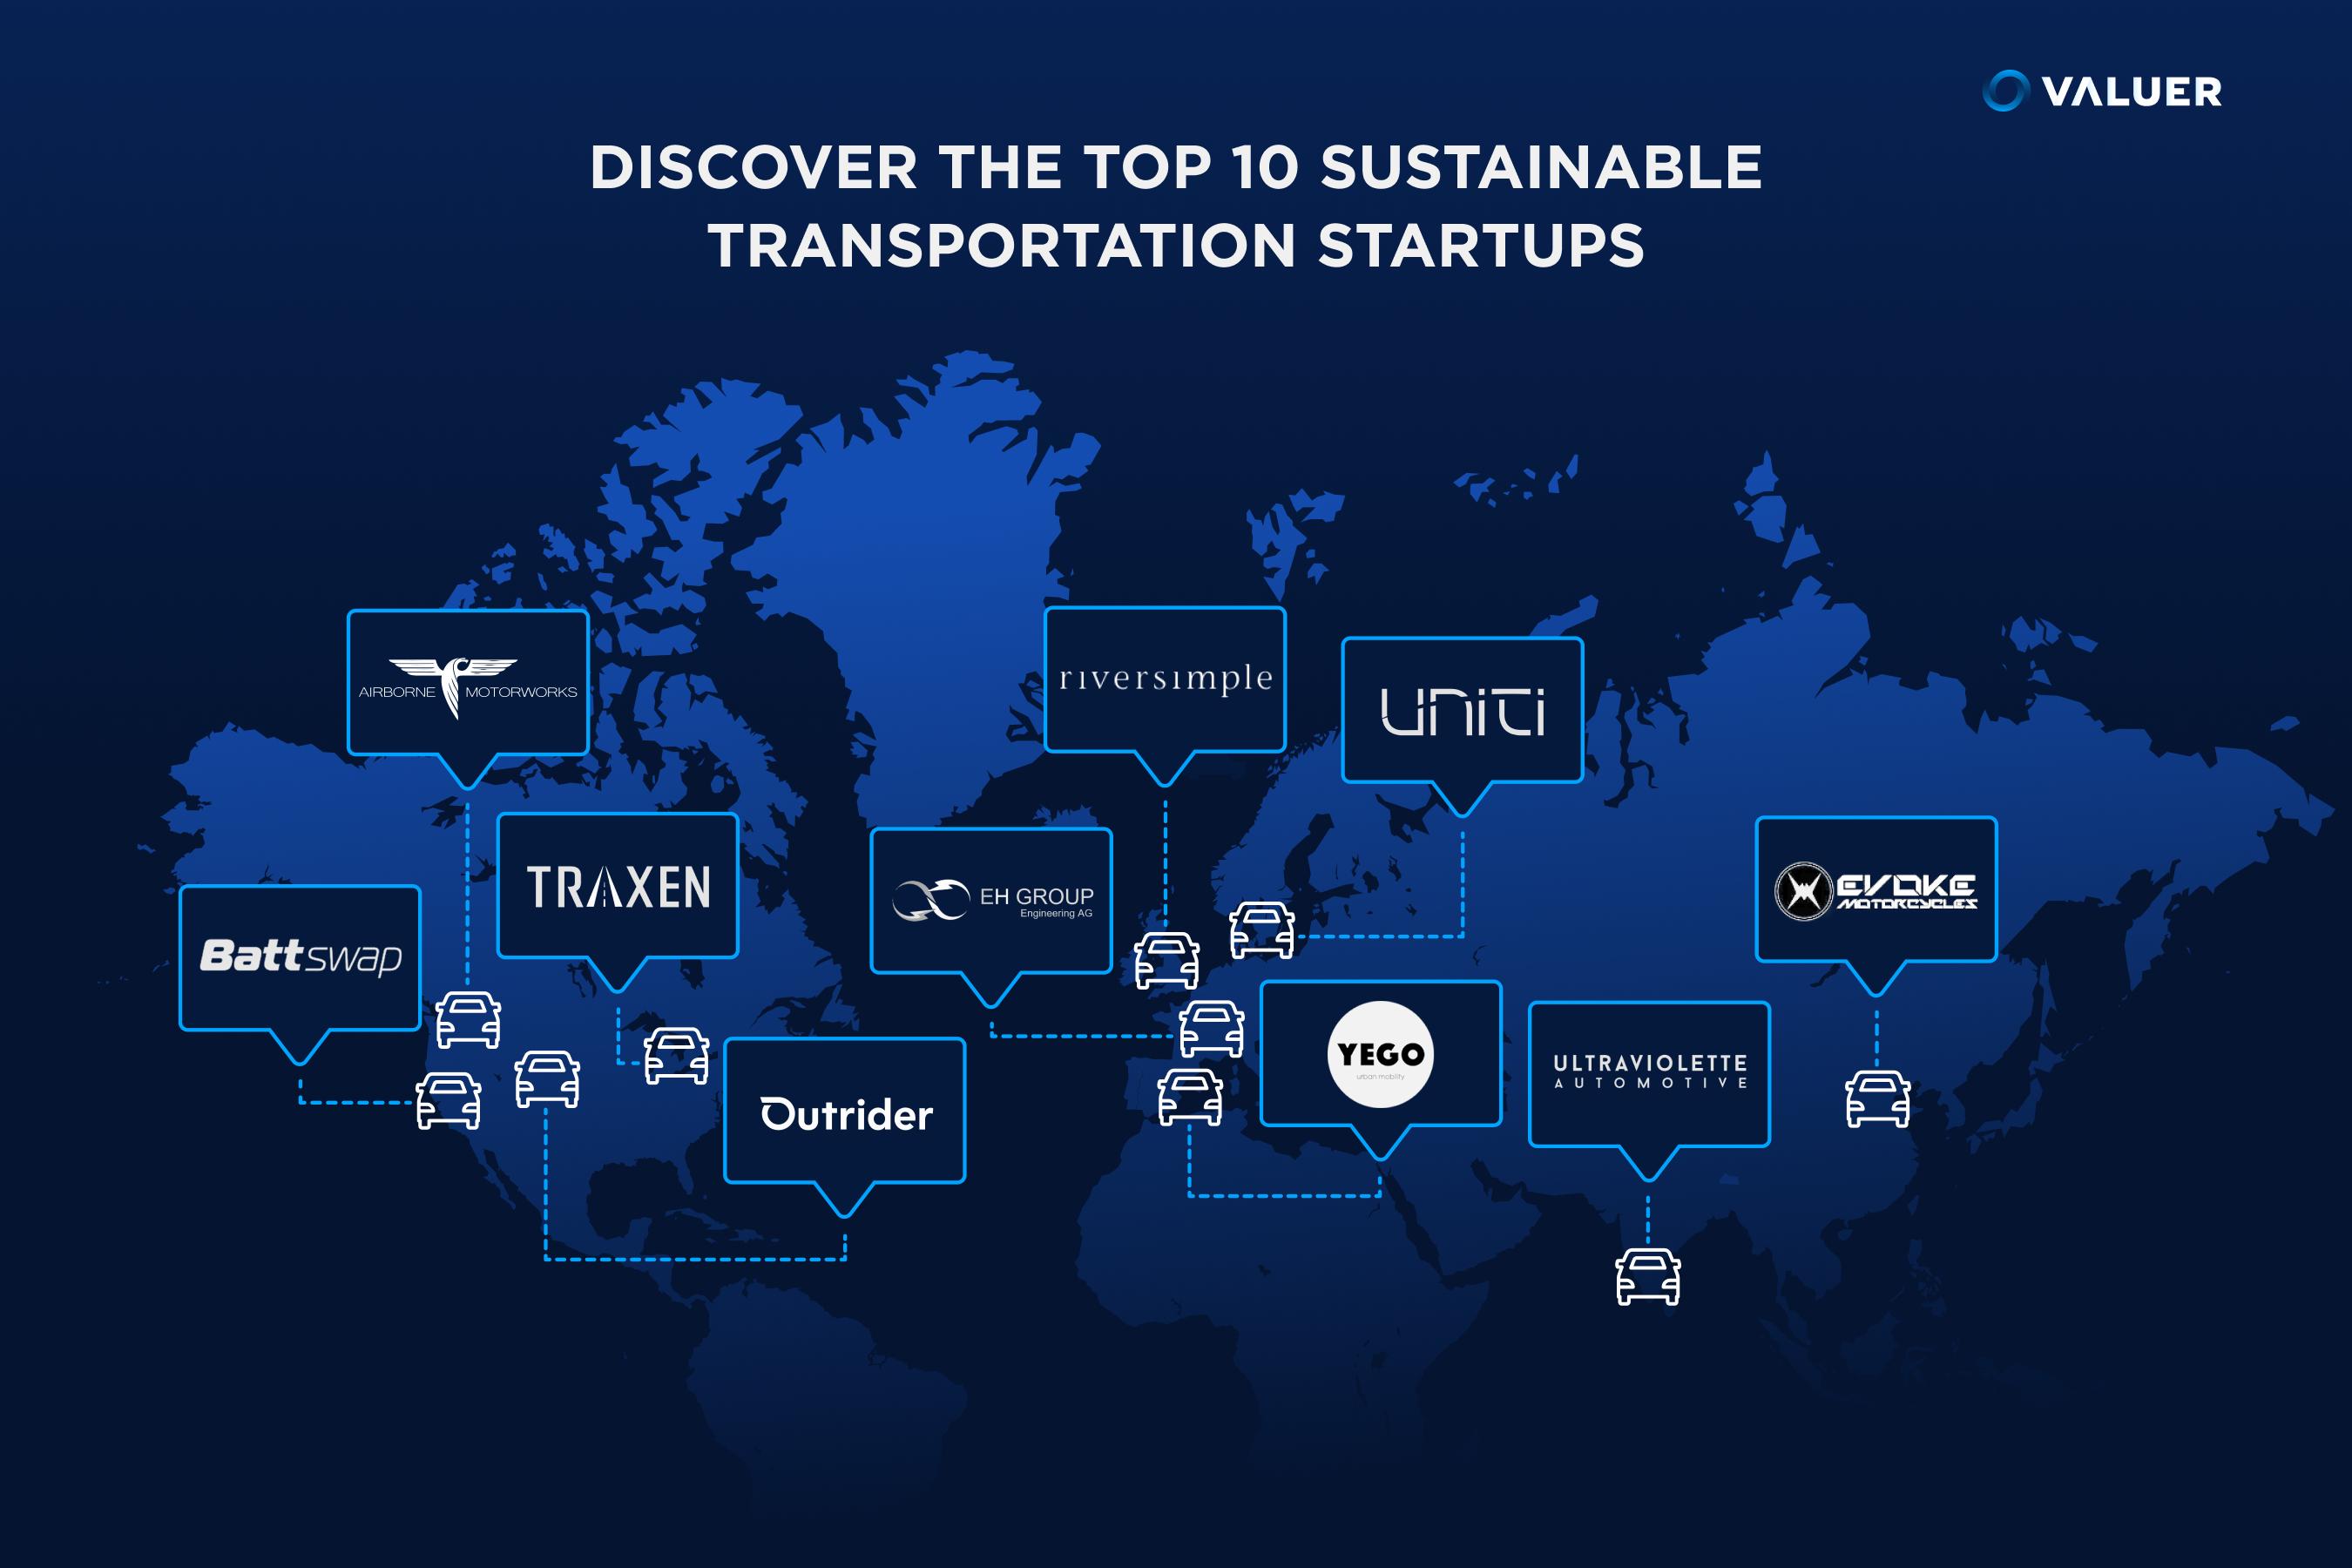 Map Image of sustainable transportation startups